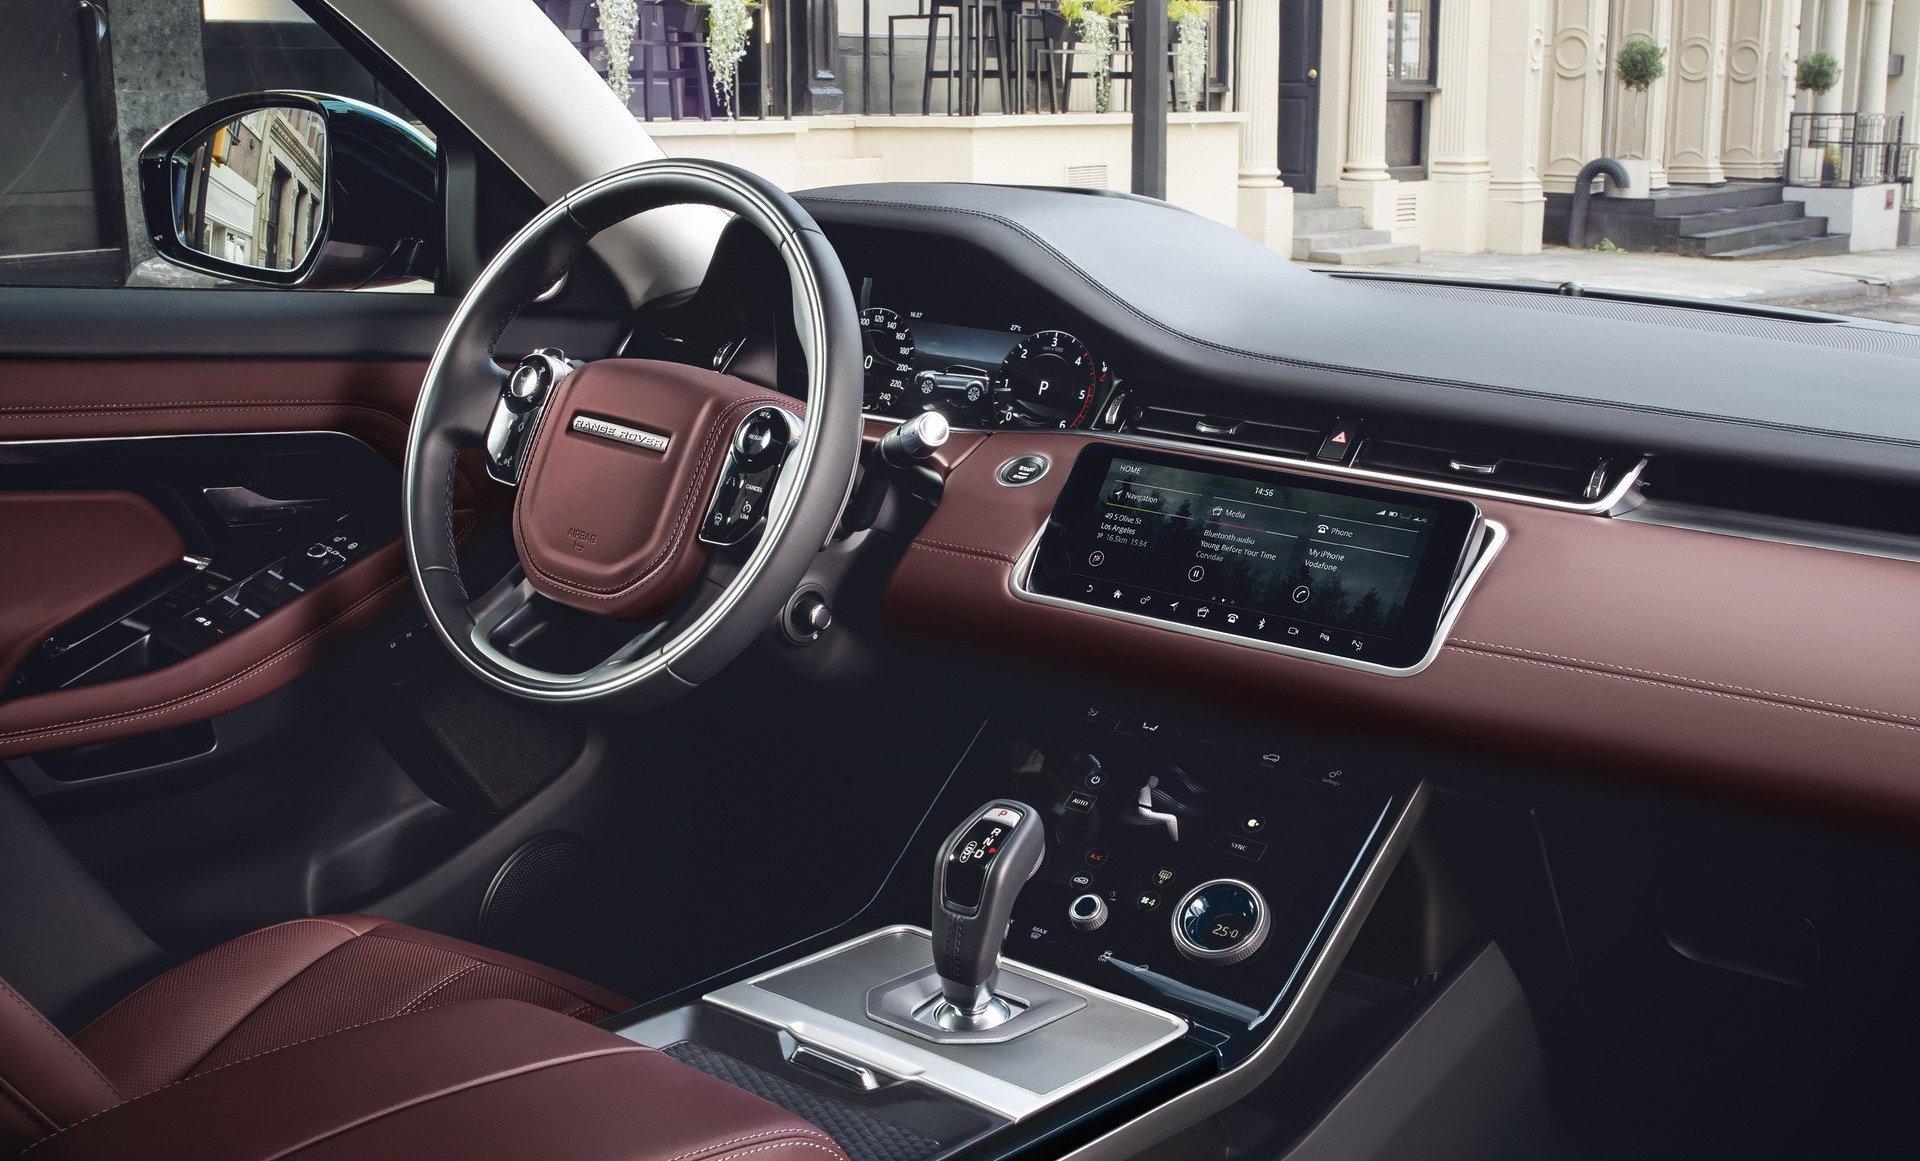 2020 Range Rover Evoque cabin